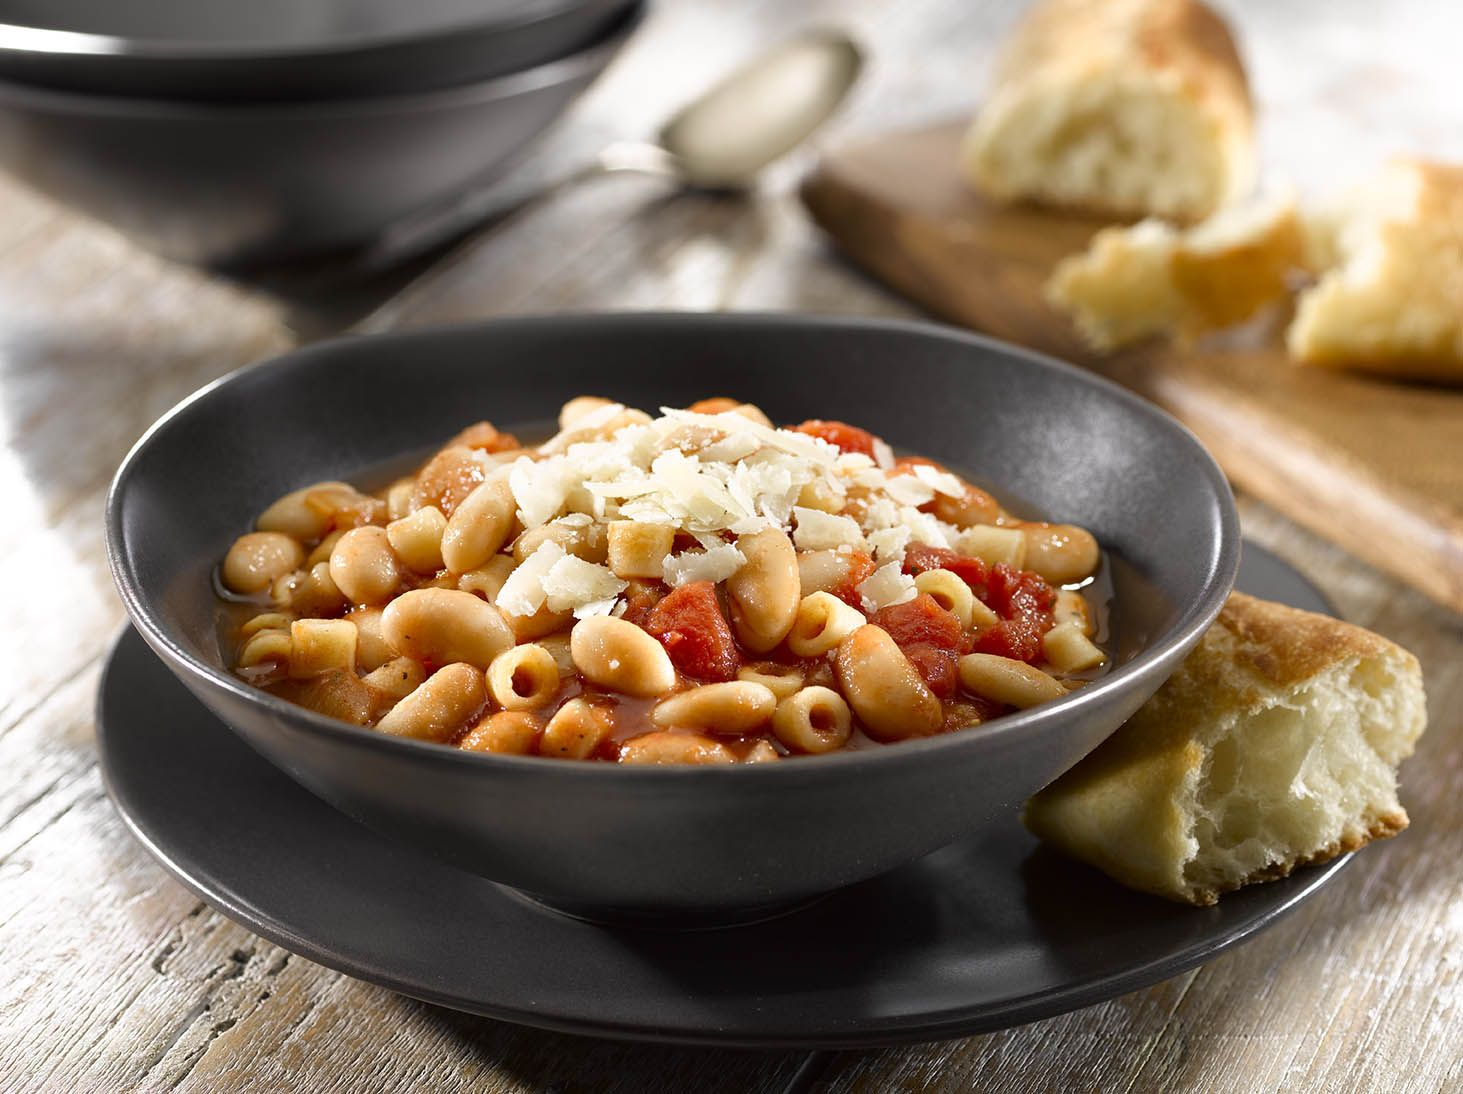 Pasta Fagioli | Recipe | Pasta fagioli, Pasta nutrition, Pasta fagioli soup